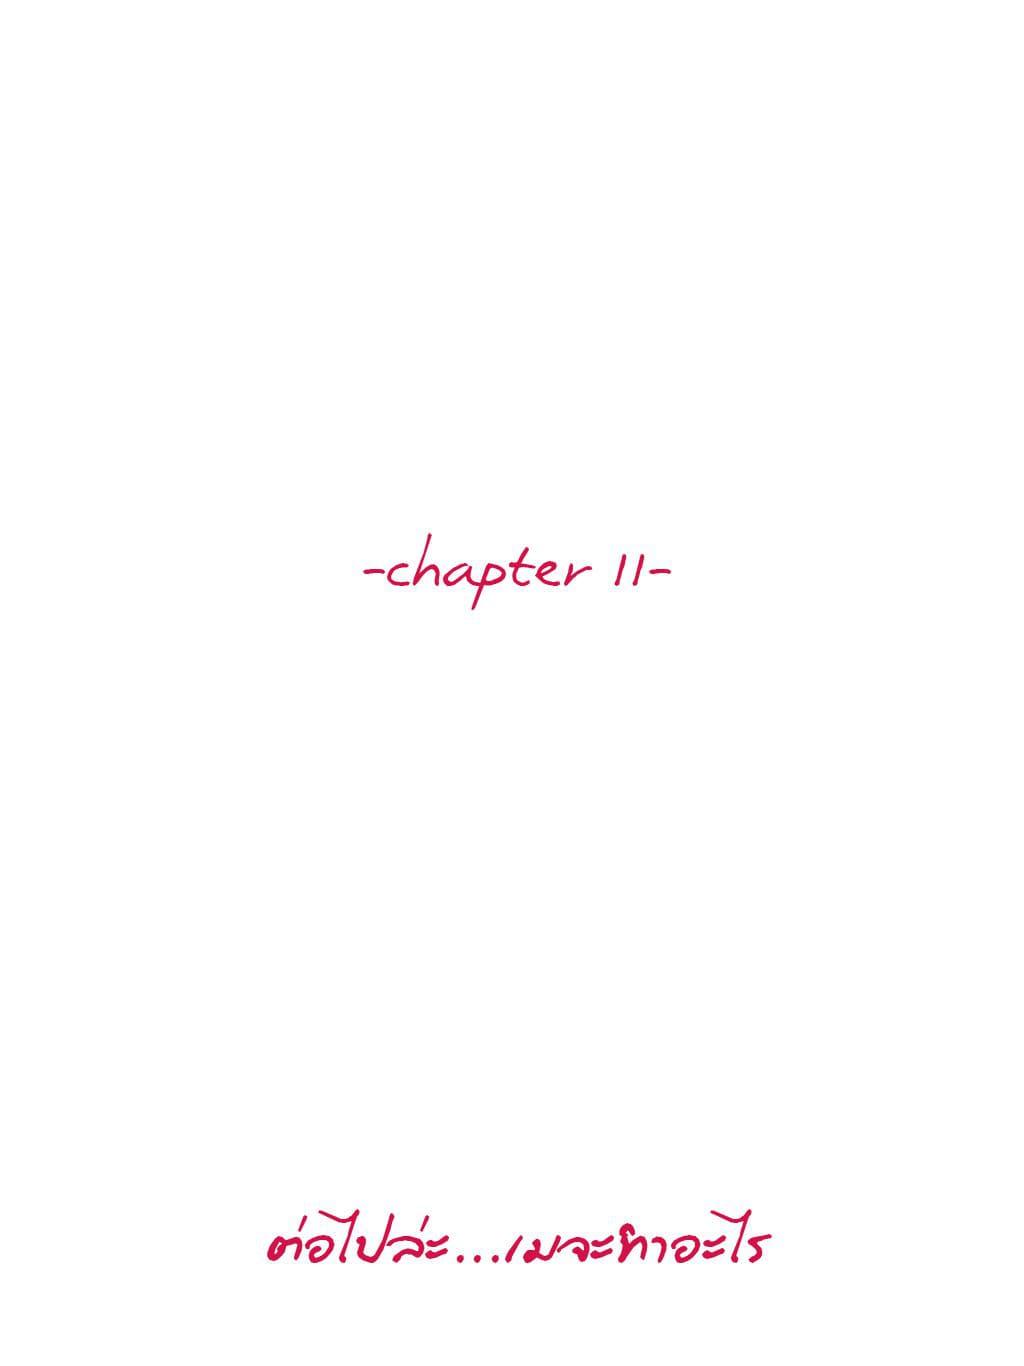 chapter 11 - ต่อไปล่ะ...เมจะทำอะไร